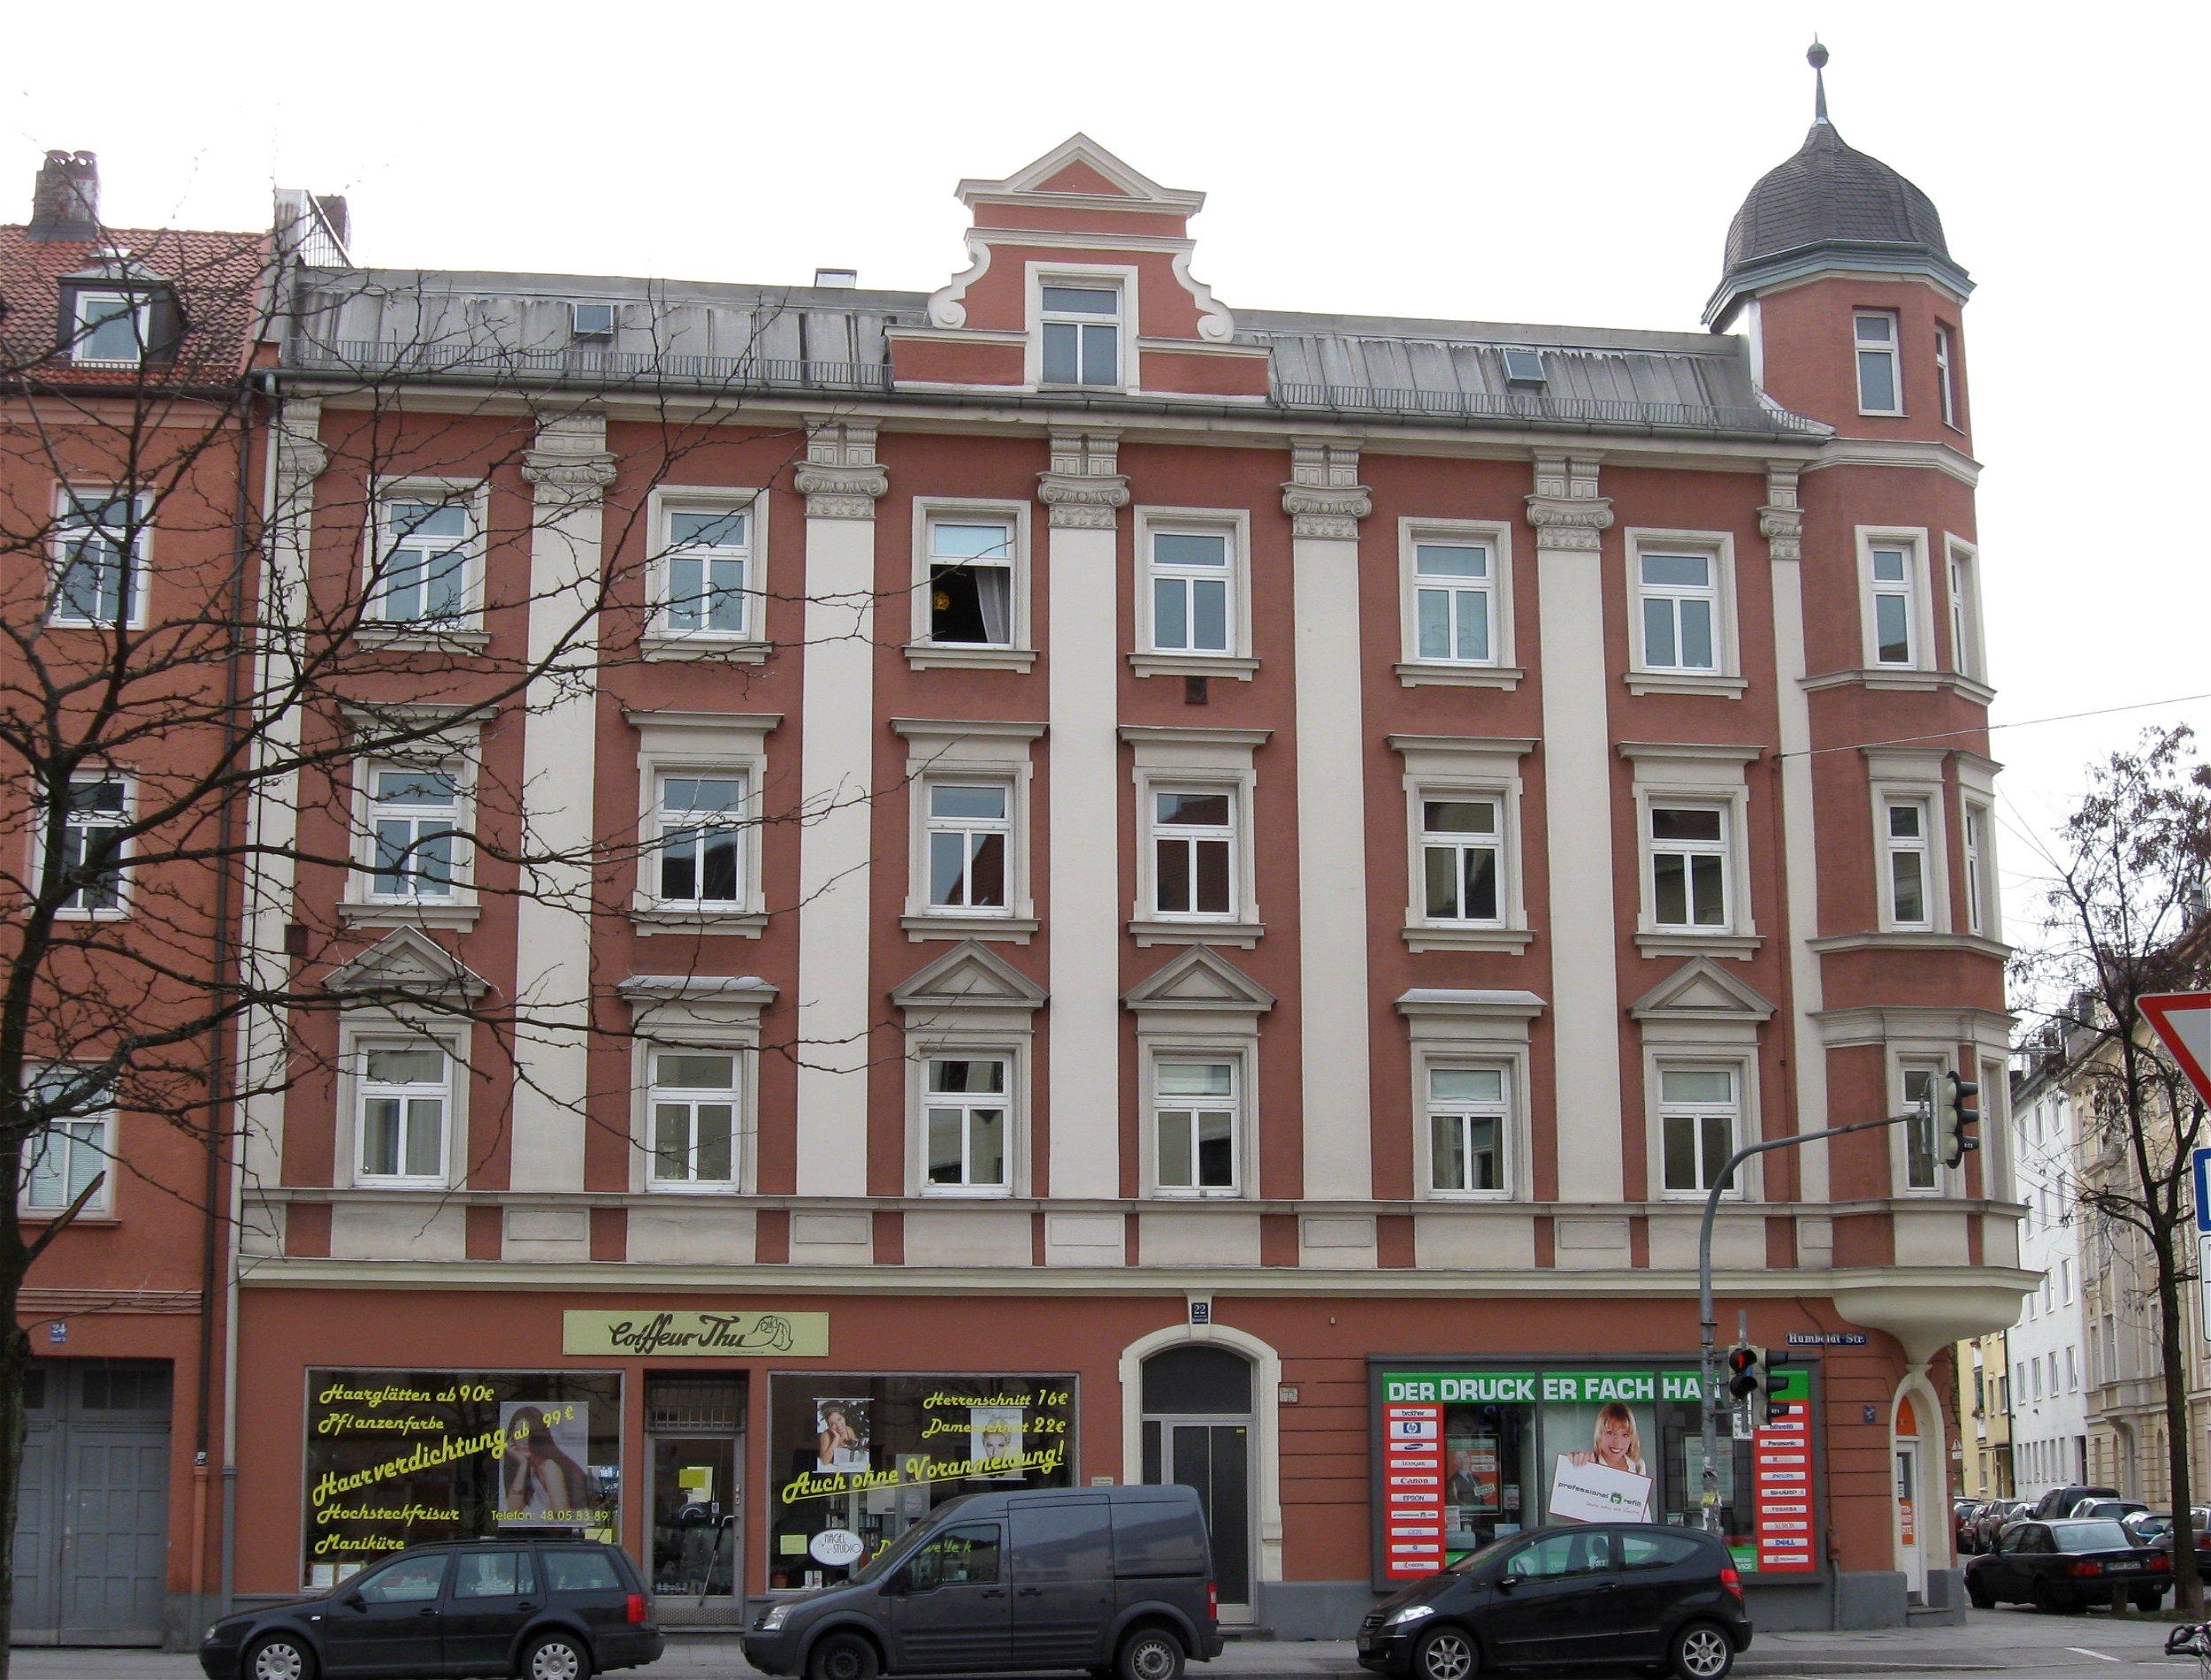 Humboldtstr München file humboldtstr 22 muenchen 1 jpg wikimedia commons